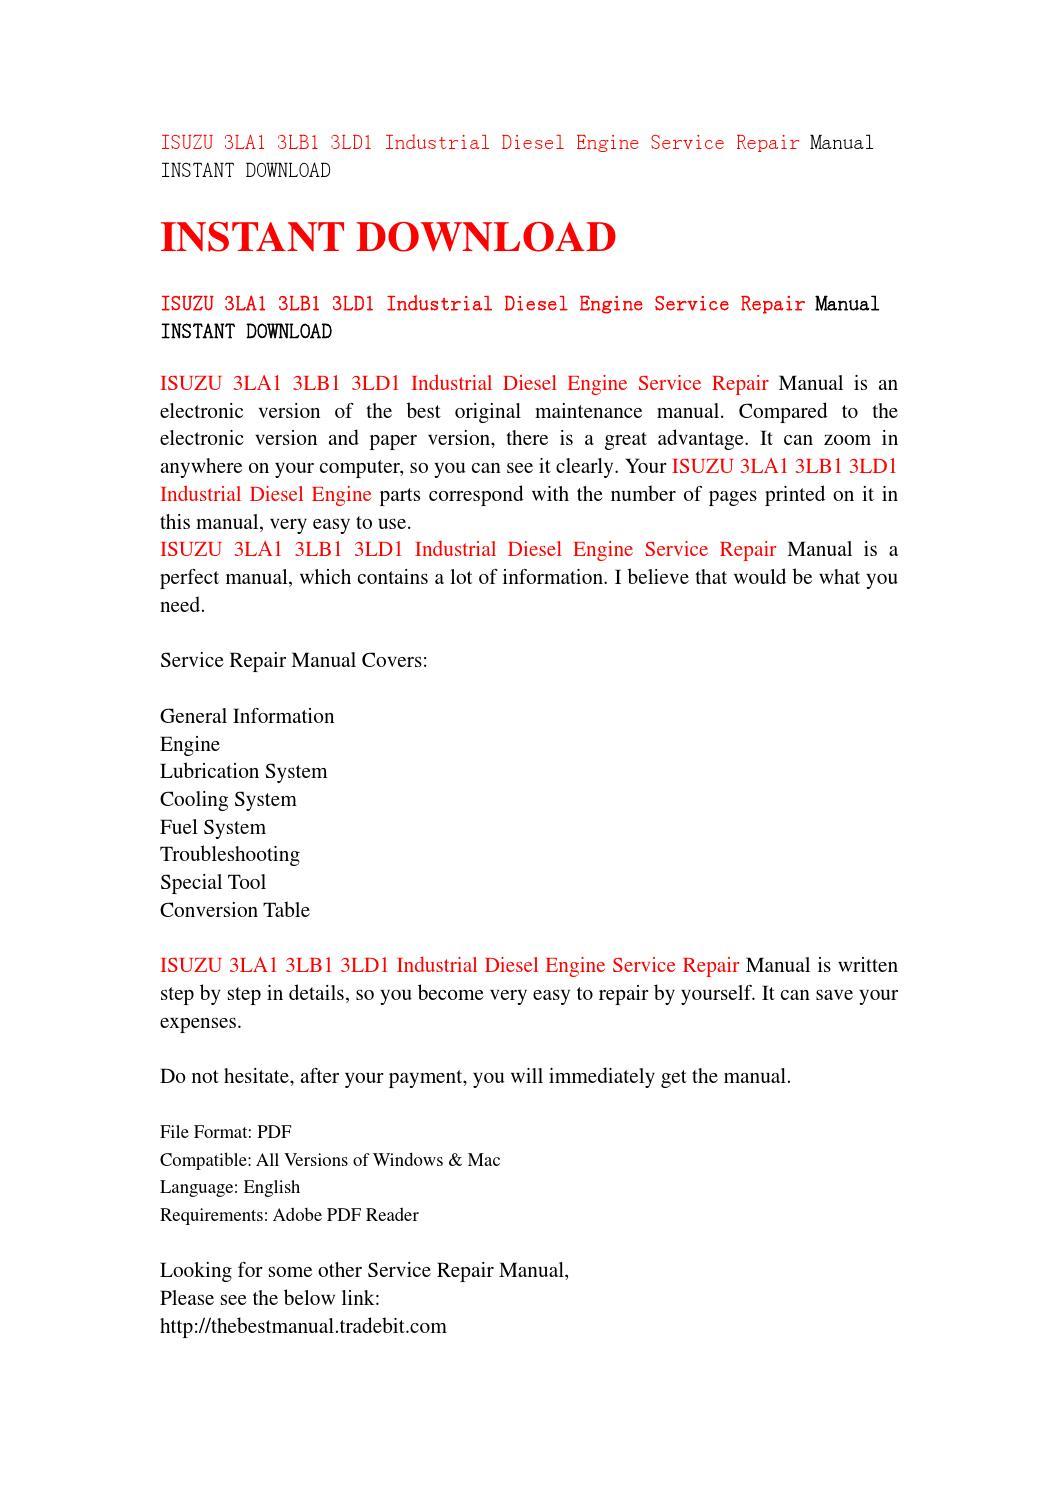 Isuzu 3la1 3lb1 3ld1 industrial diesel engine service repair manual instant  download by jfhsjefn - issuu